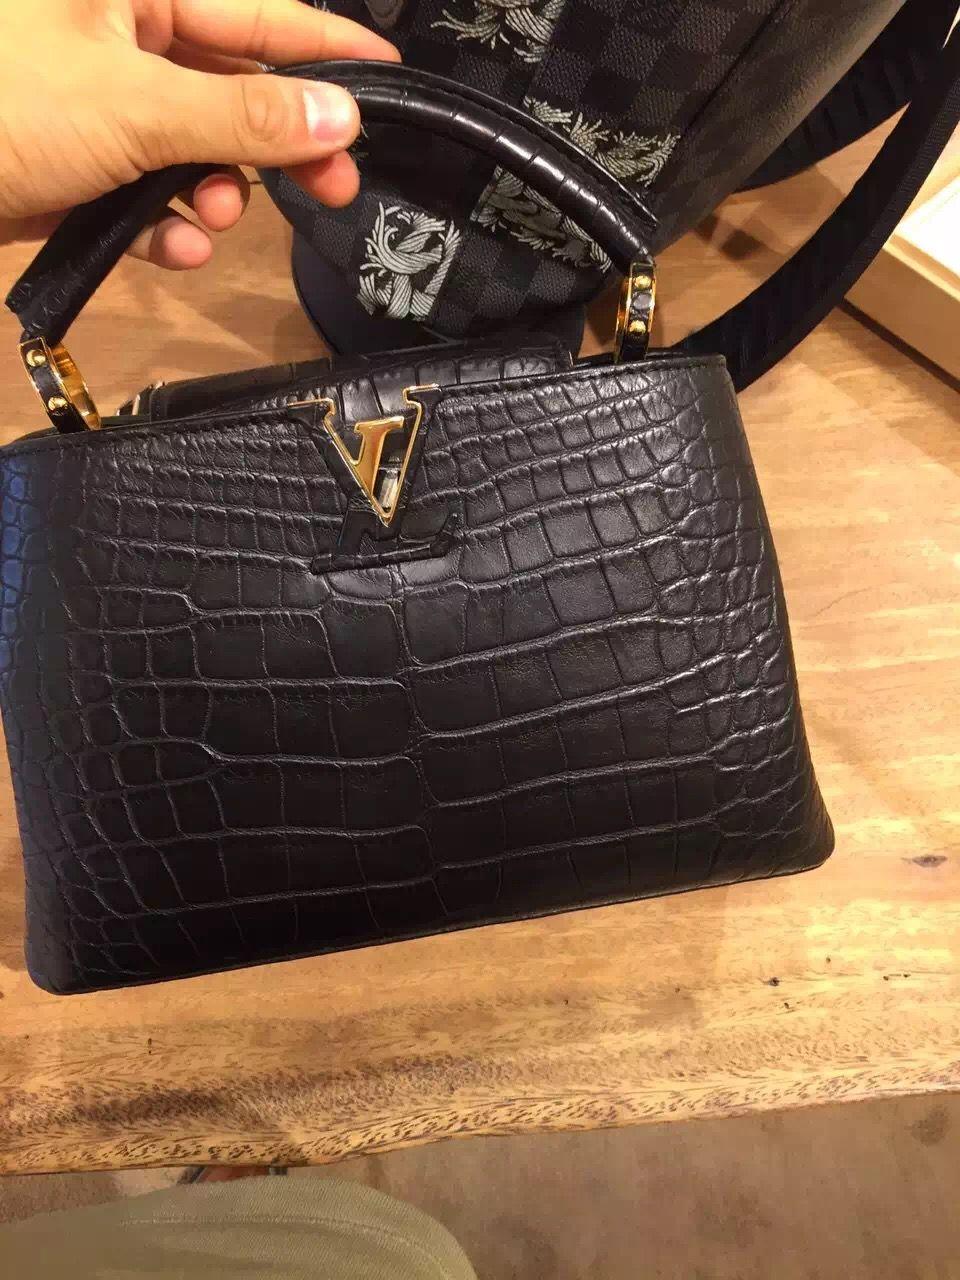 1d79fa000c7d Authentic Louis Vuitton Capucines Bb Crocodile Skin Bag N91636 B